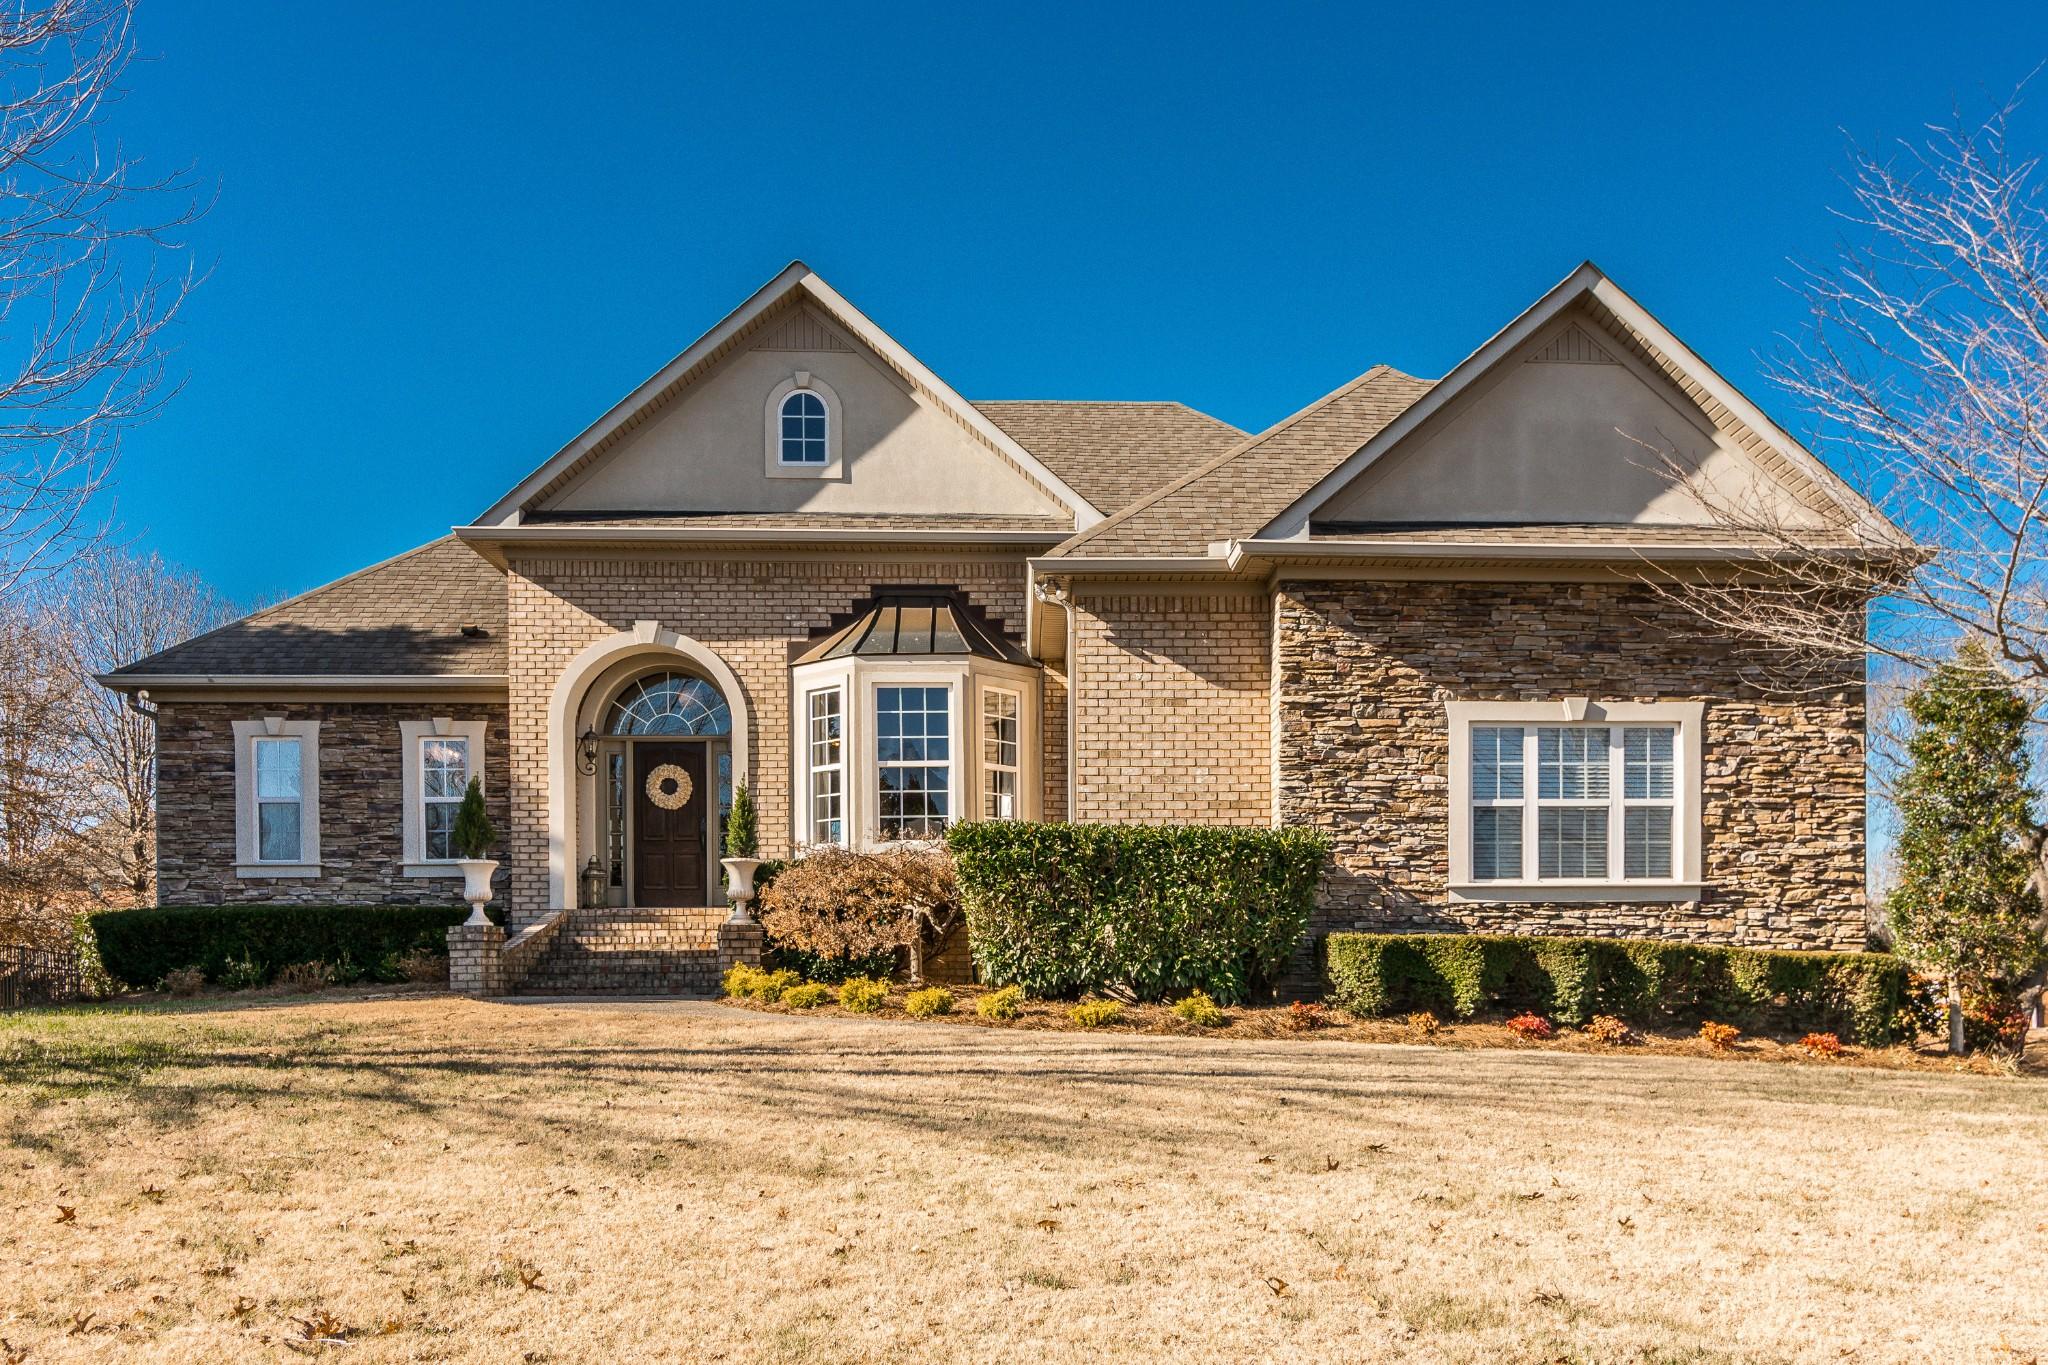 990 Wyndham Drive, Gallatin, TN 37066 - Gallatin, TN real estate listing